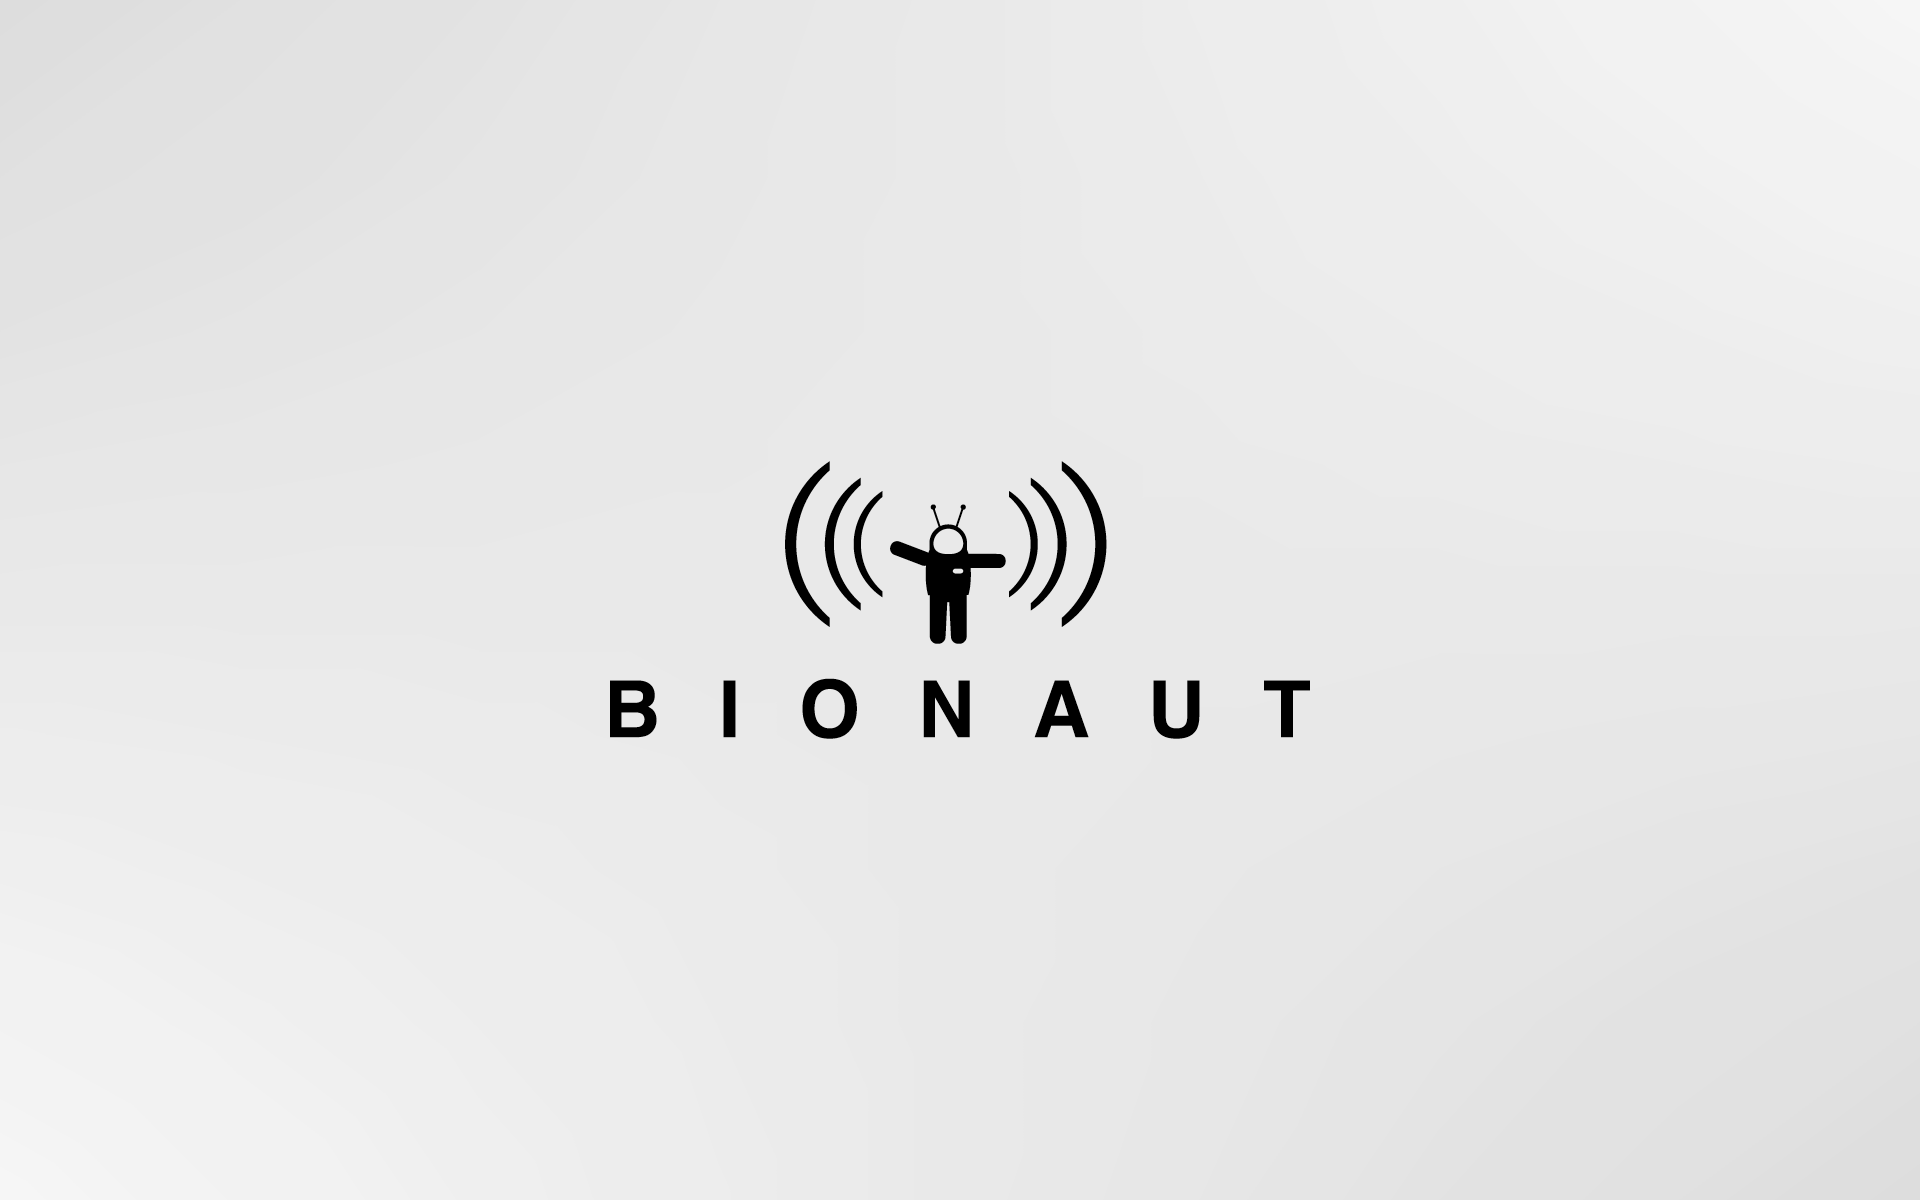 2000-Bionaut-logo